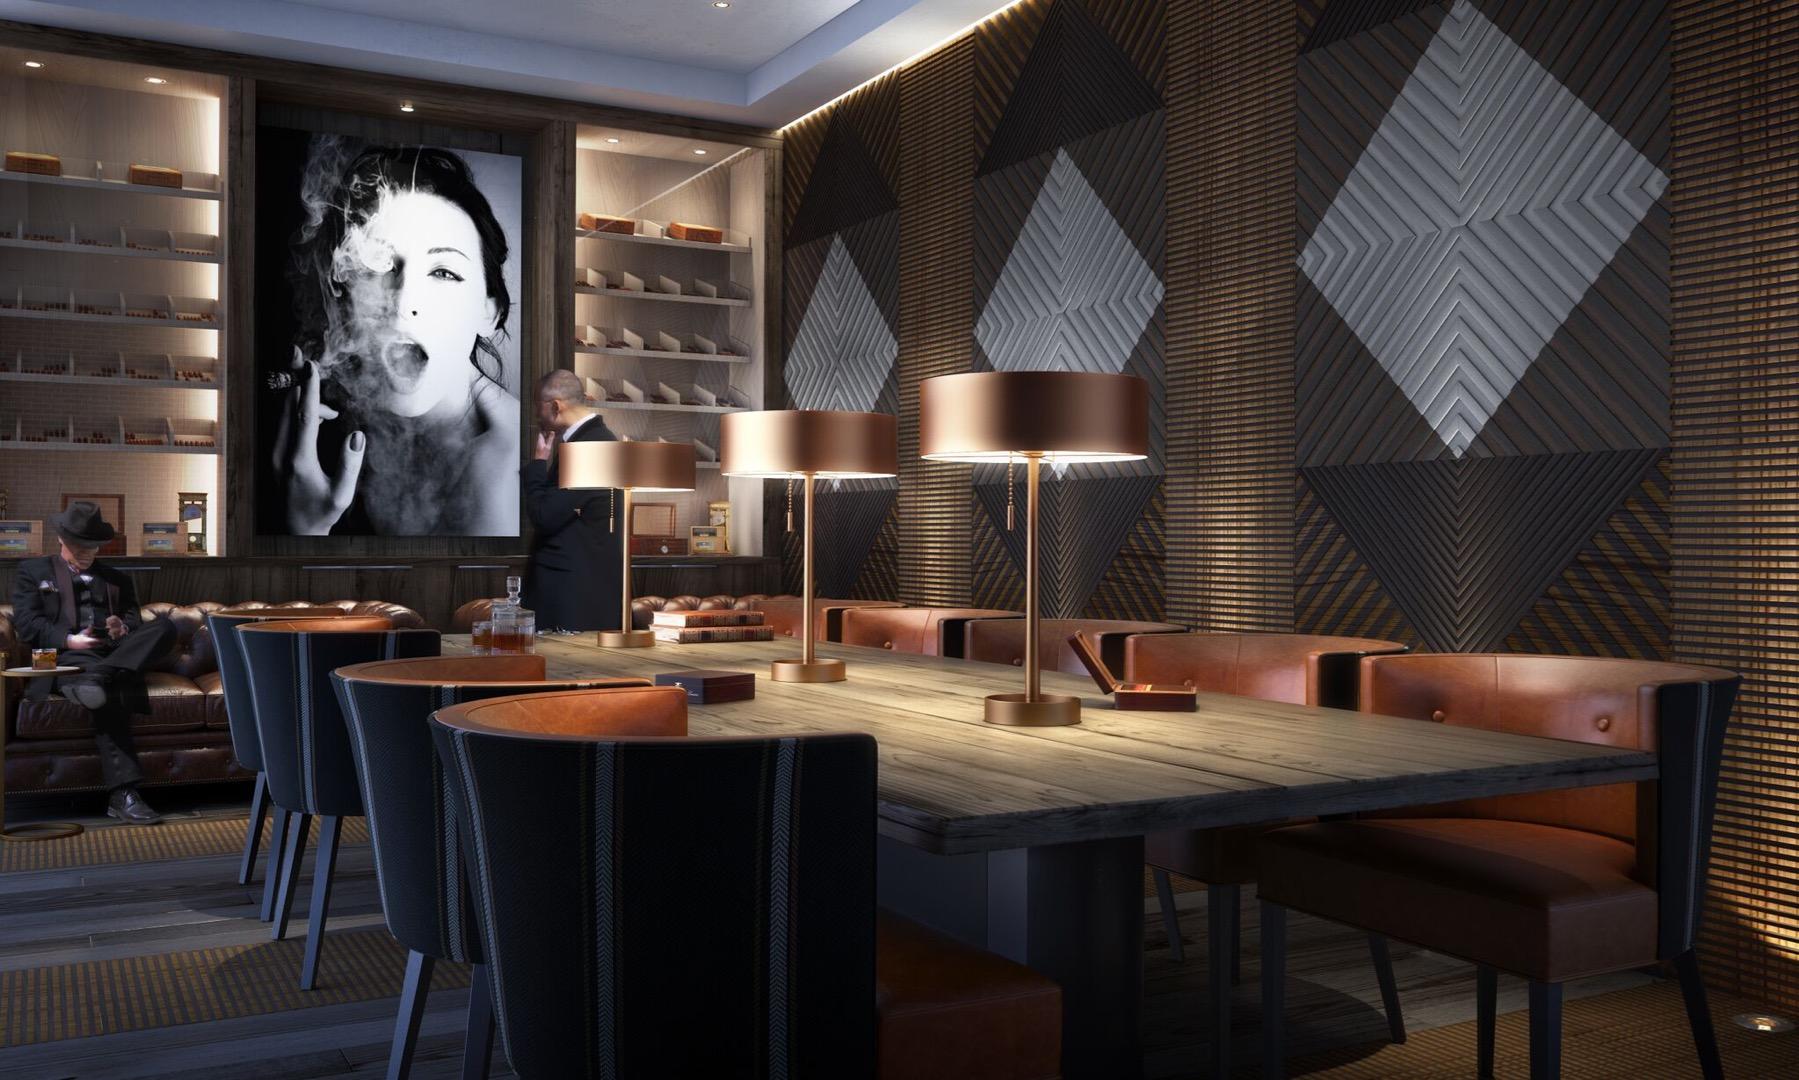 Cigar Lounge & Billiards room image 1